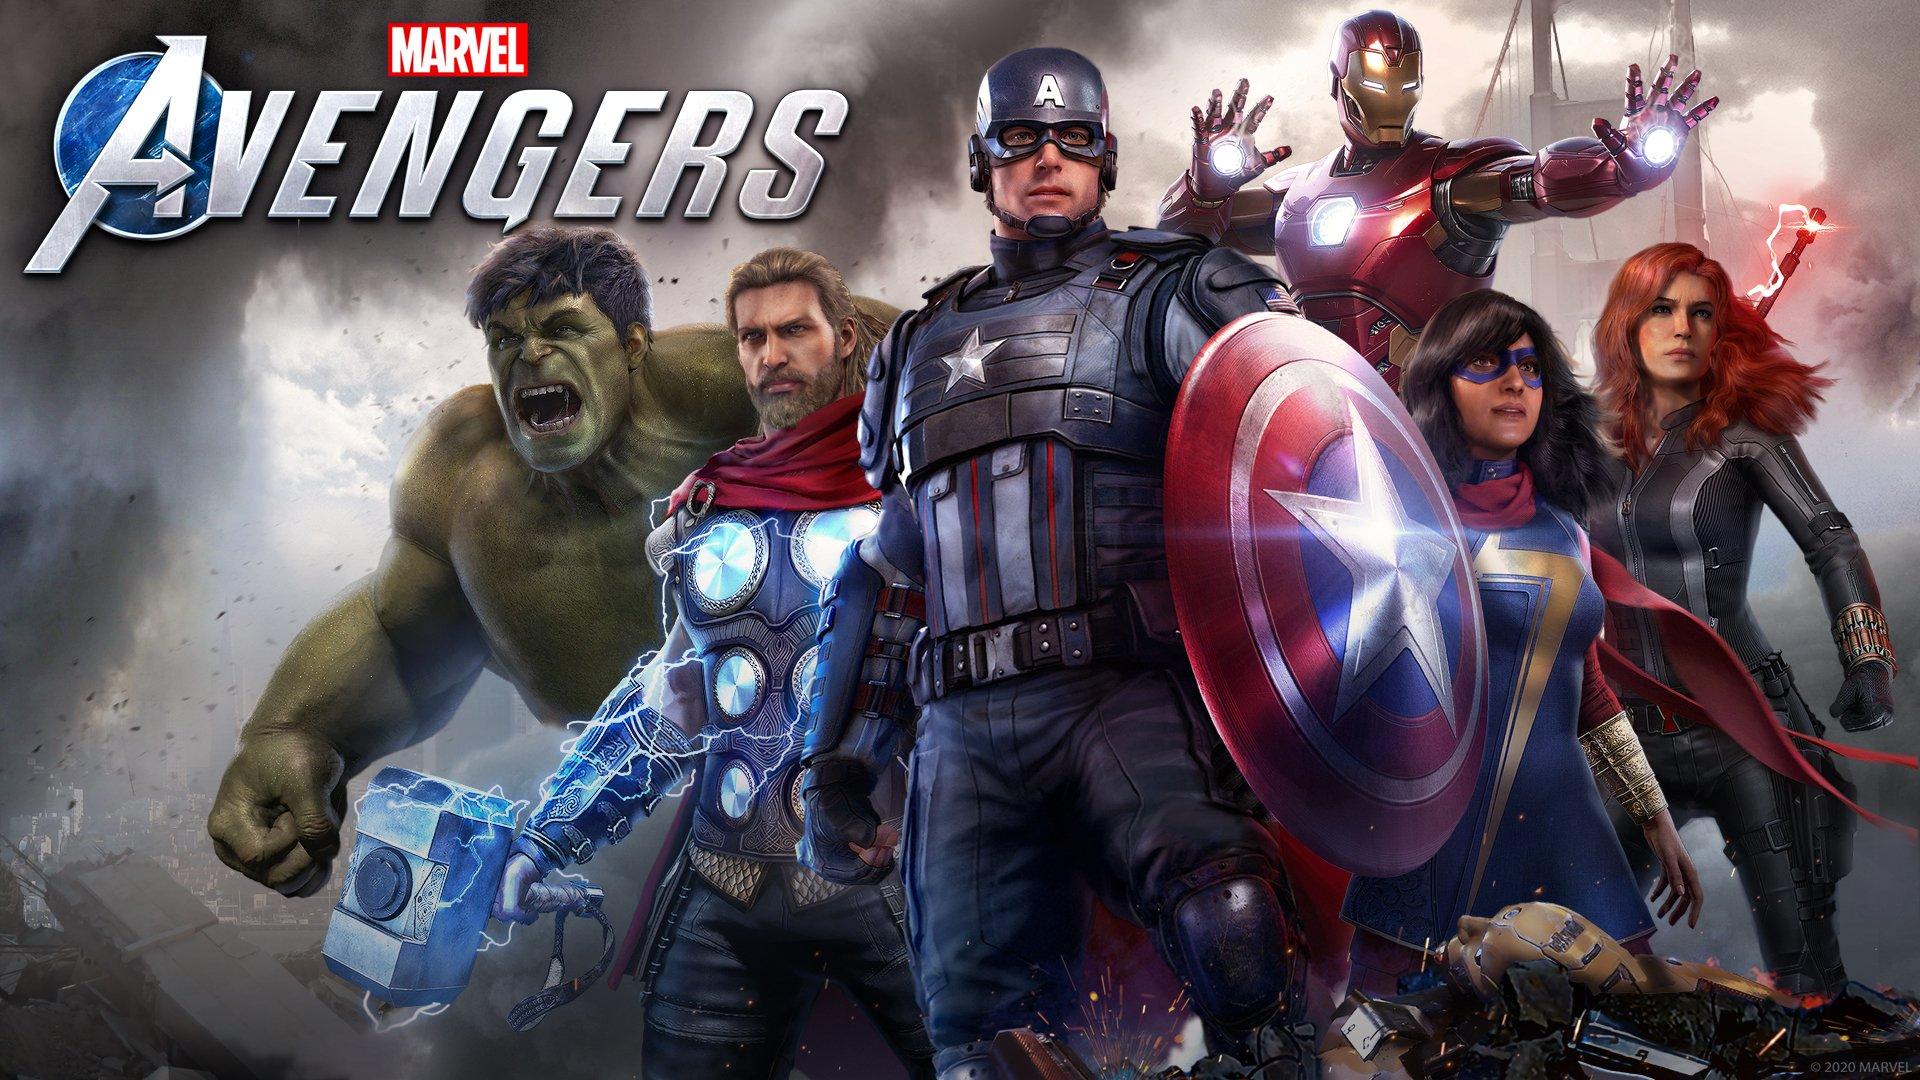 Блоги, Marvel's Avengers, PlayStation 4, Marvel, PlayStation 5, Xbox One, Xbox One S